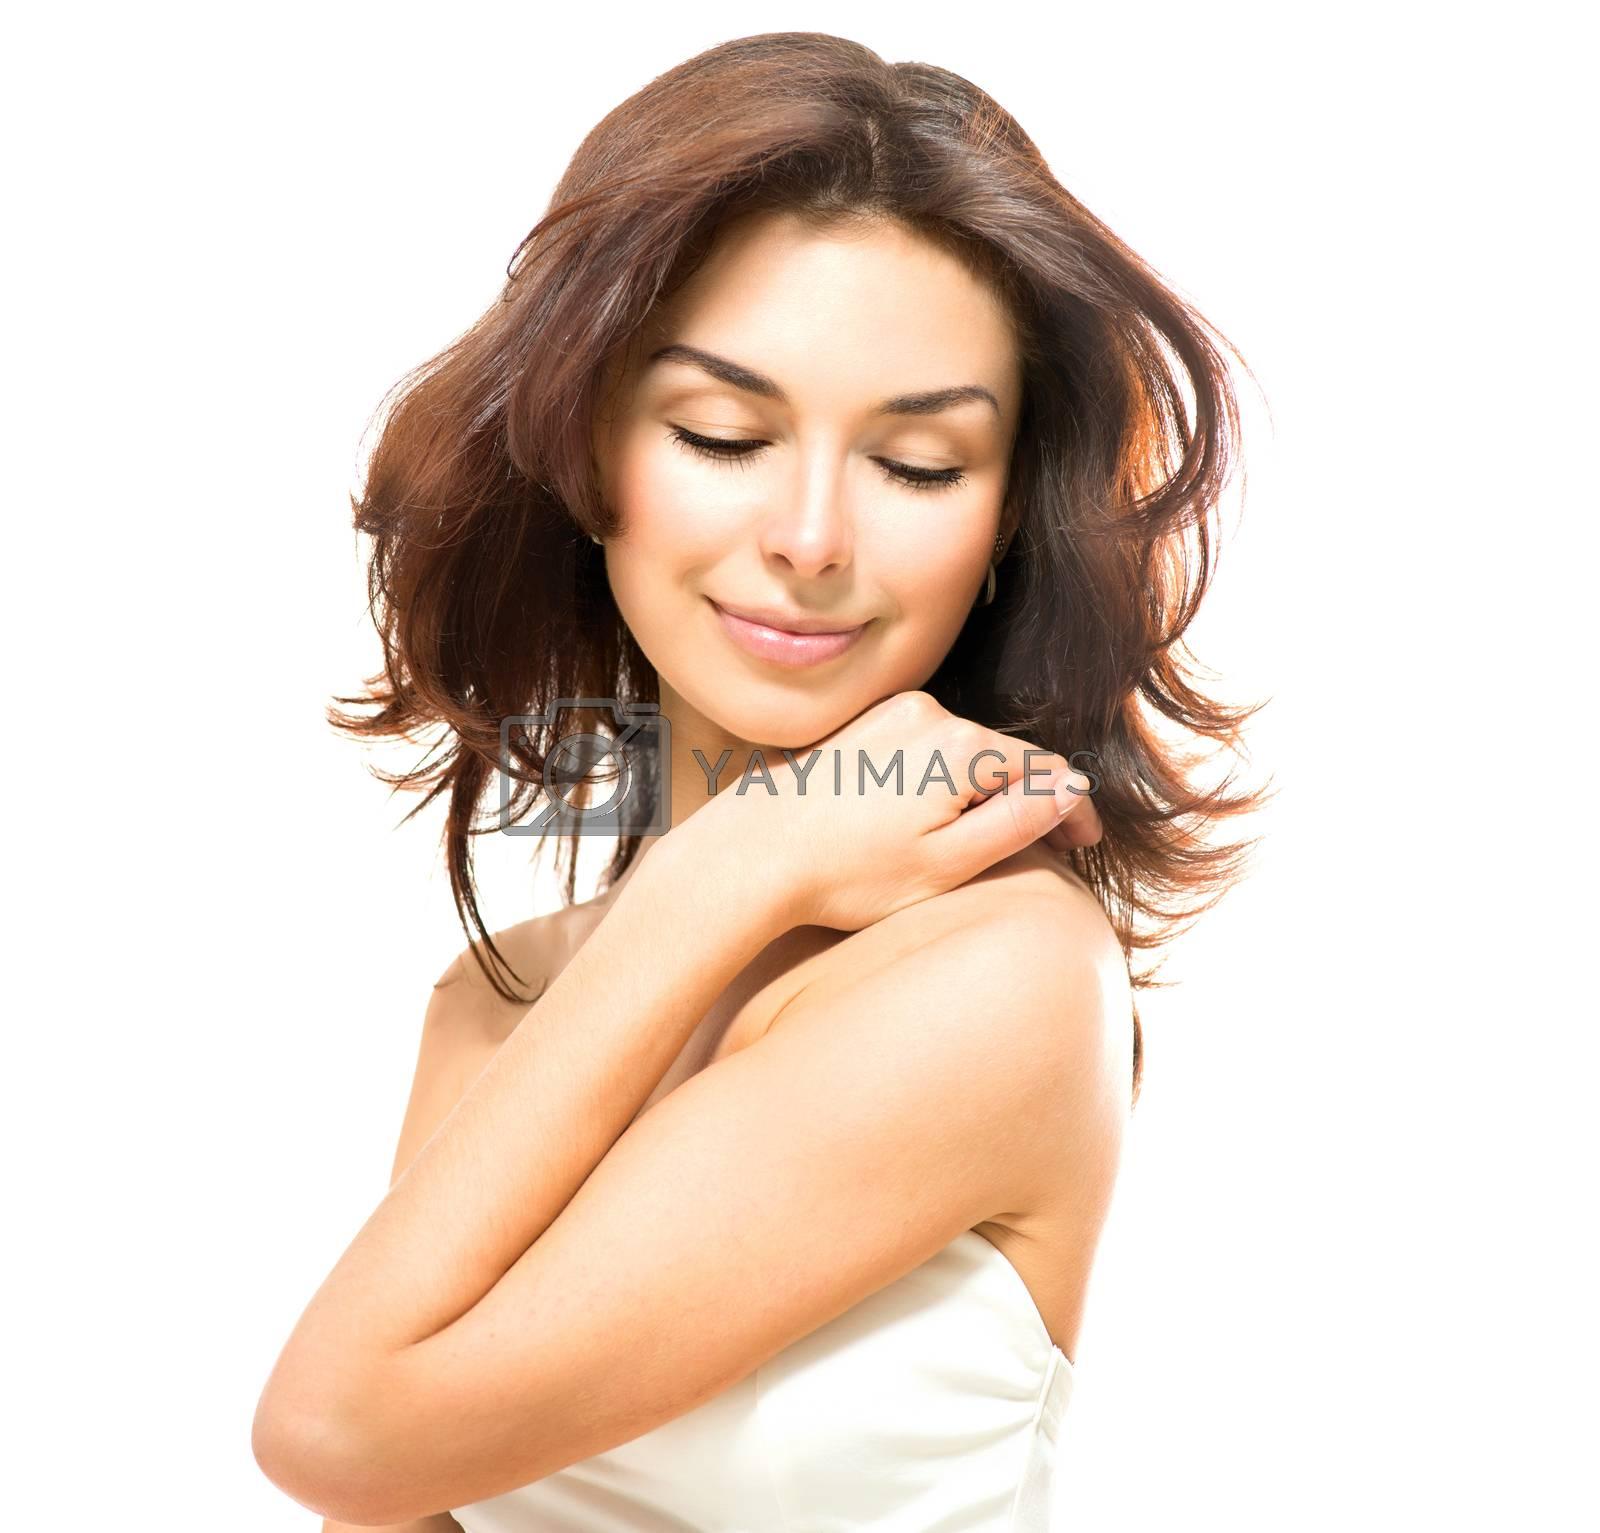 Beauty Woman. Beautiful Young Female Touching Her Skin  by SubbotinaA